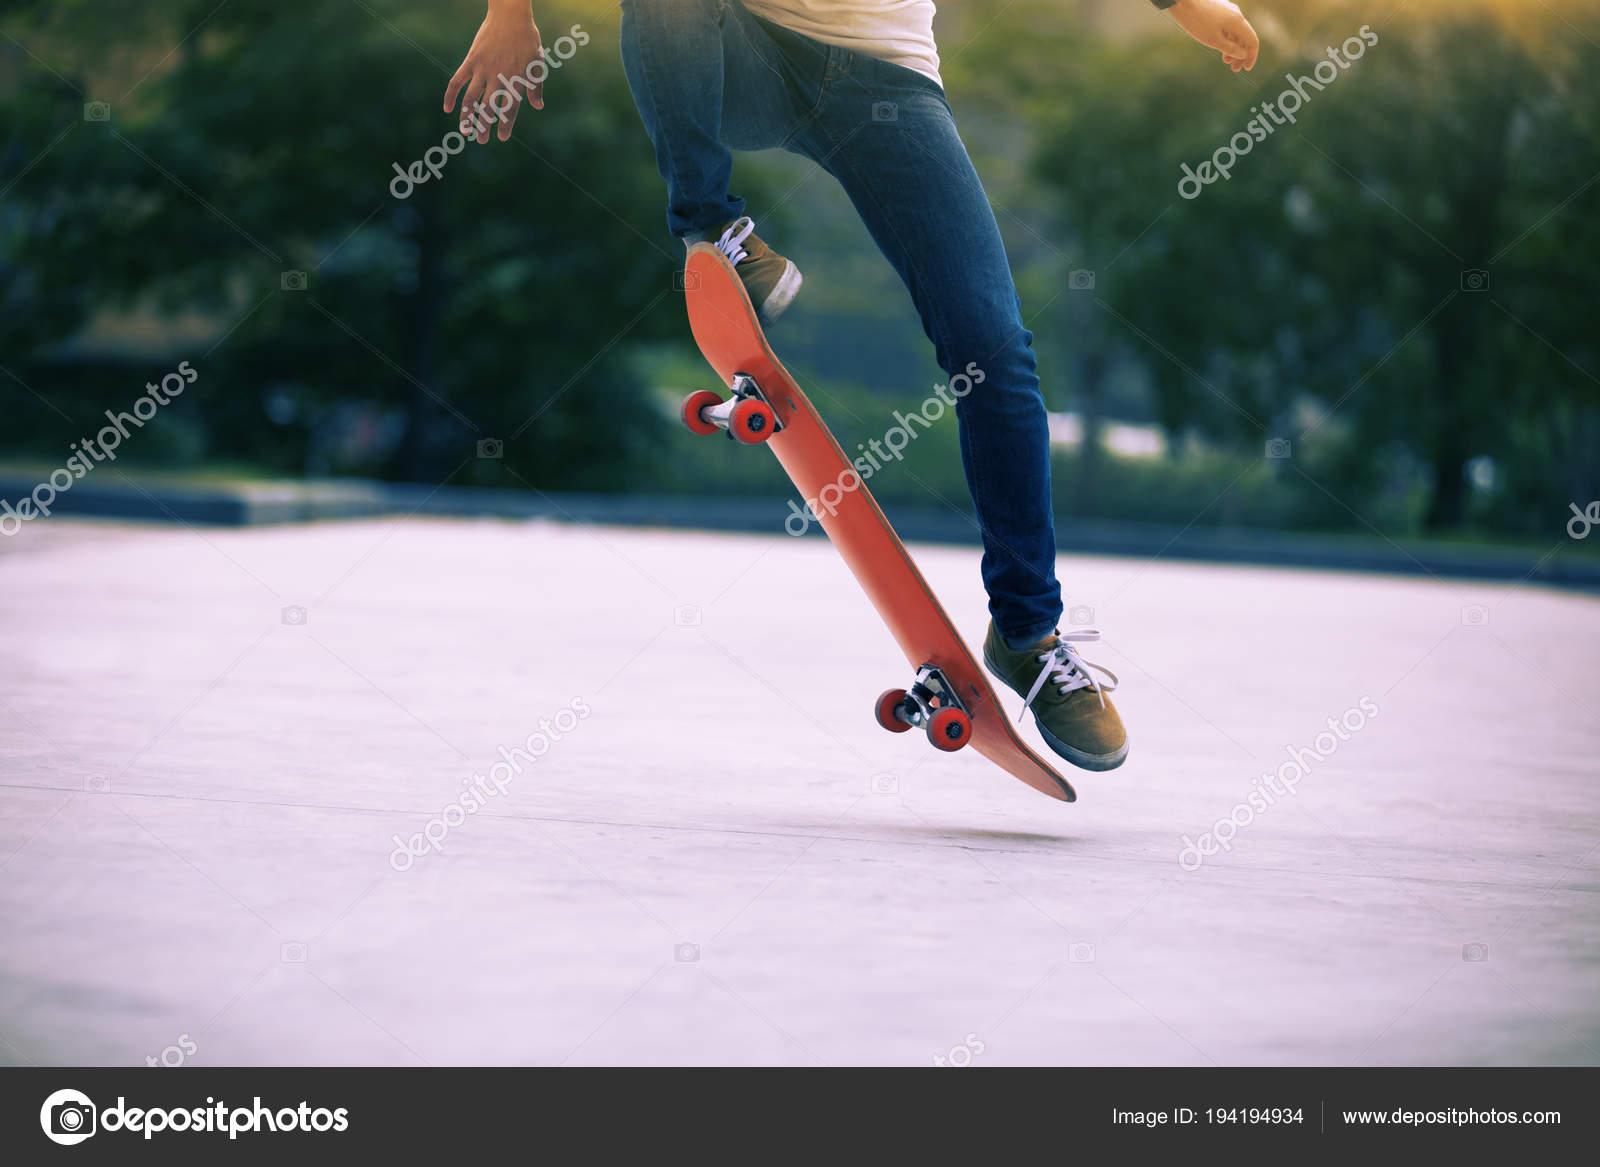 1914a25f Skatista Andando Skate Parque Estacionamento — Stock Photo © lzf ...